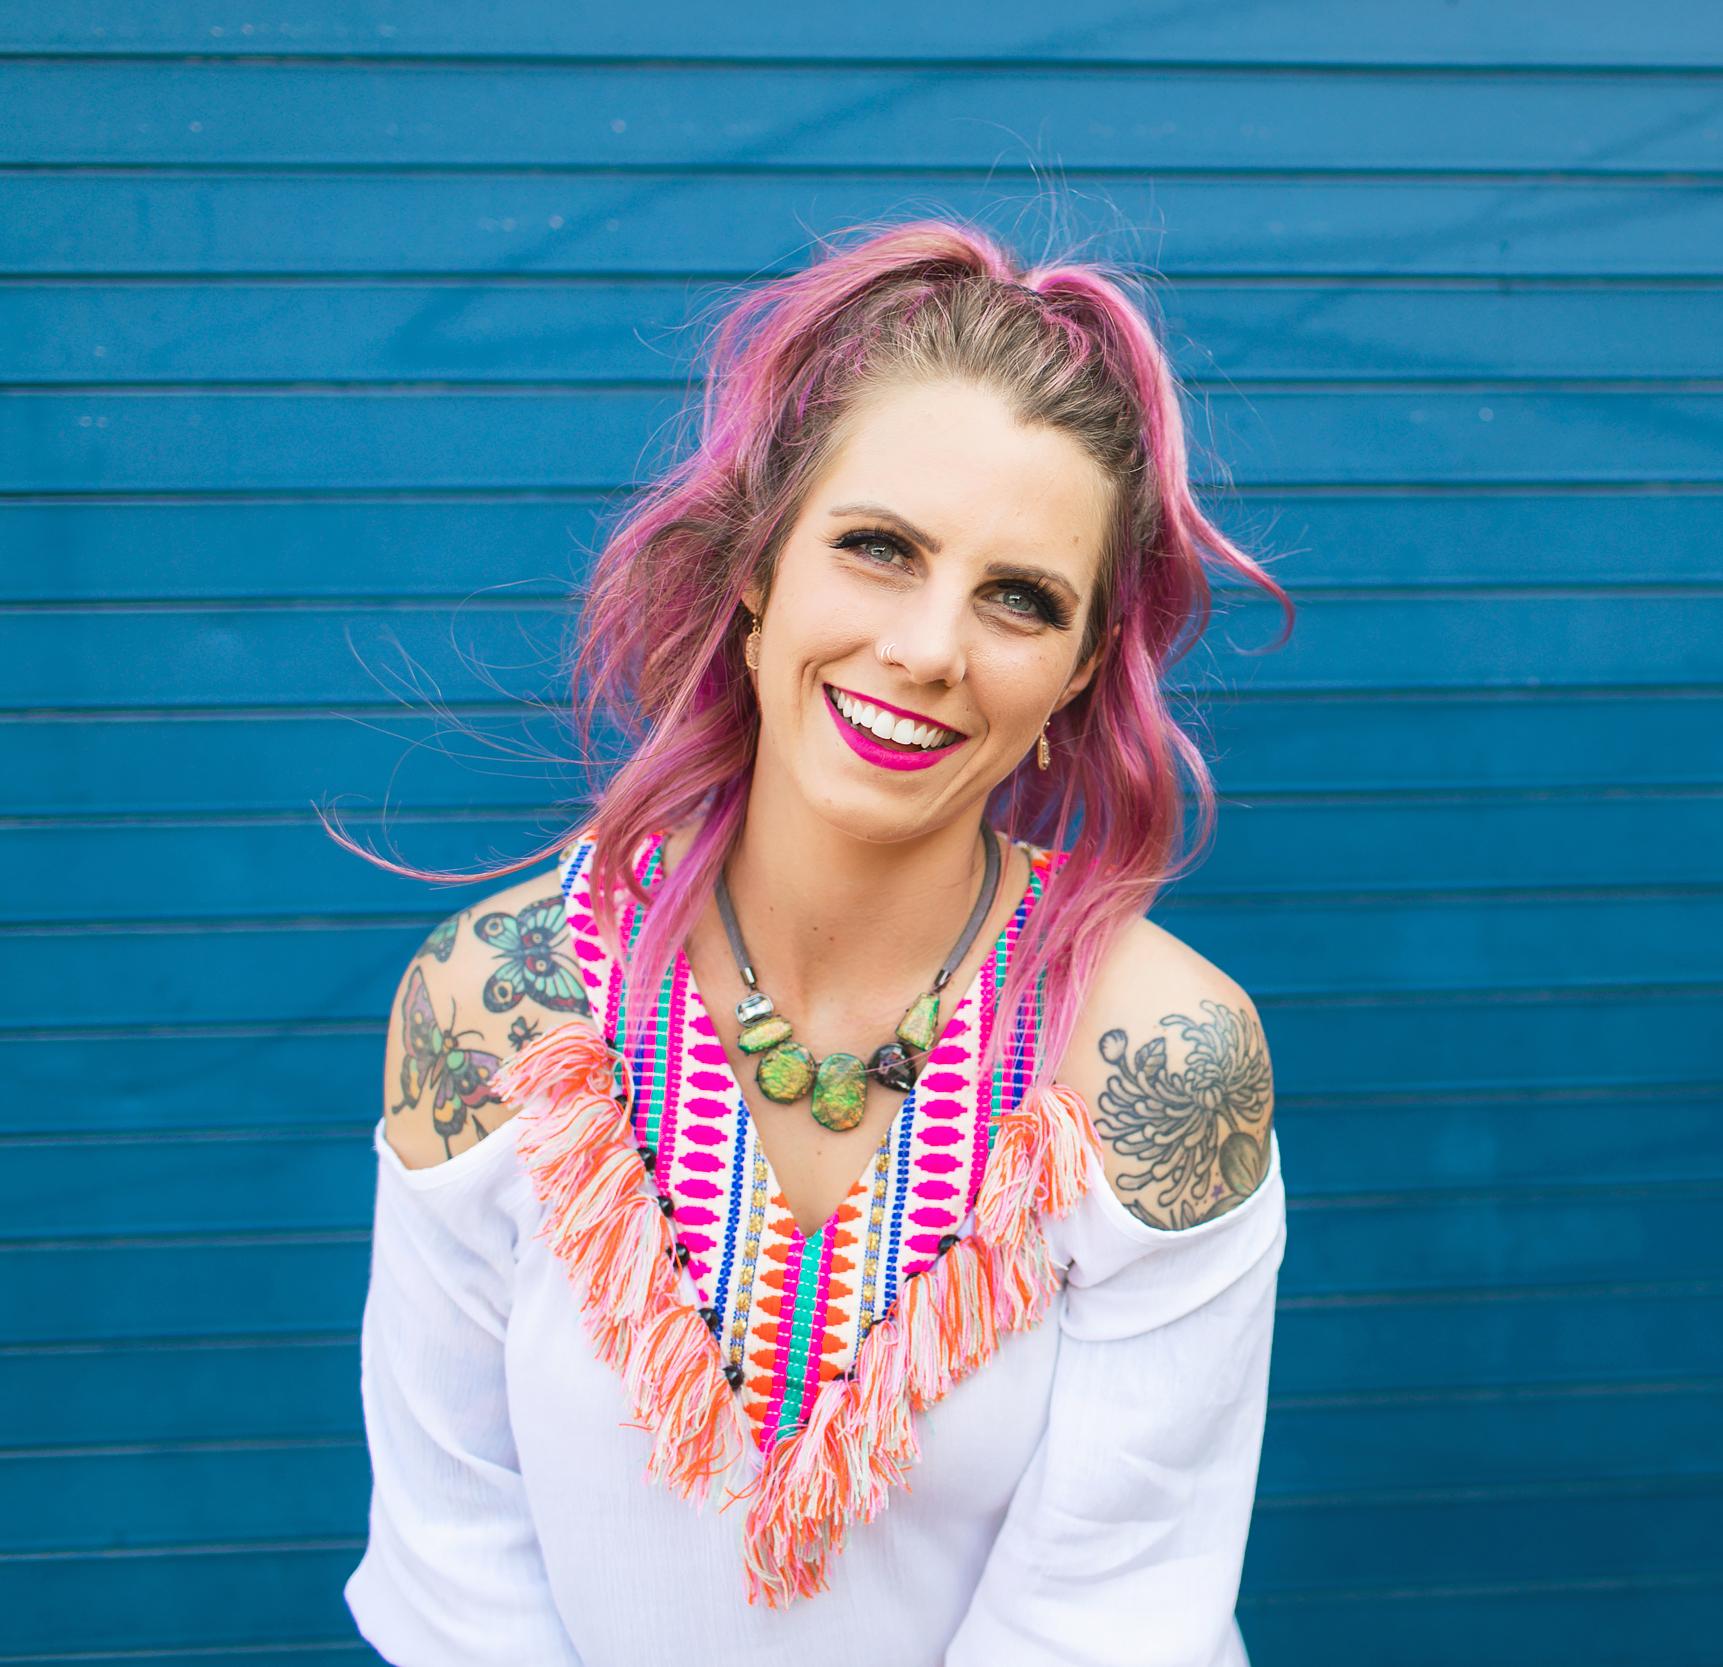 Psychic Medium, Tarot Reader, and Inspirational Leader Brittney Carmichael on Living Open